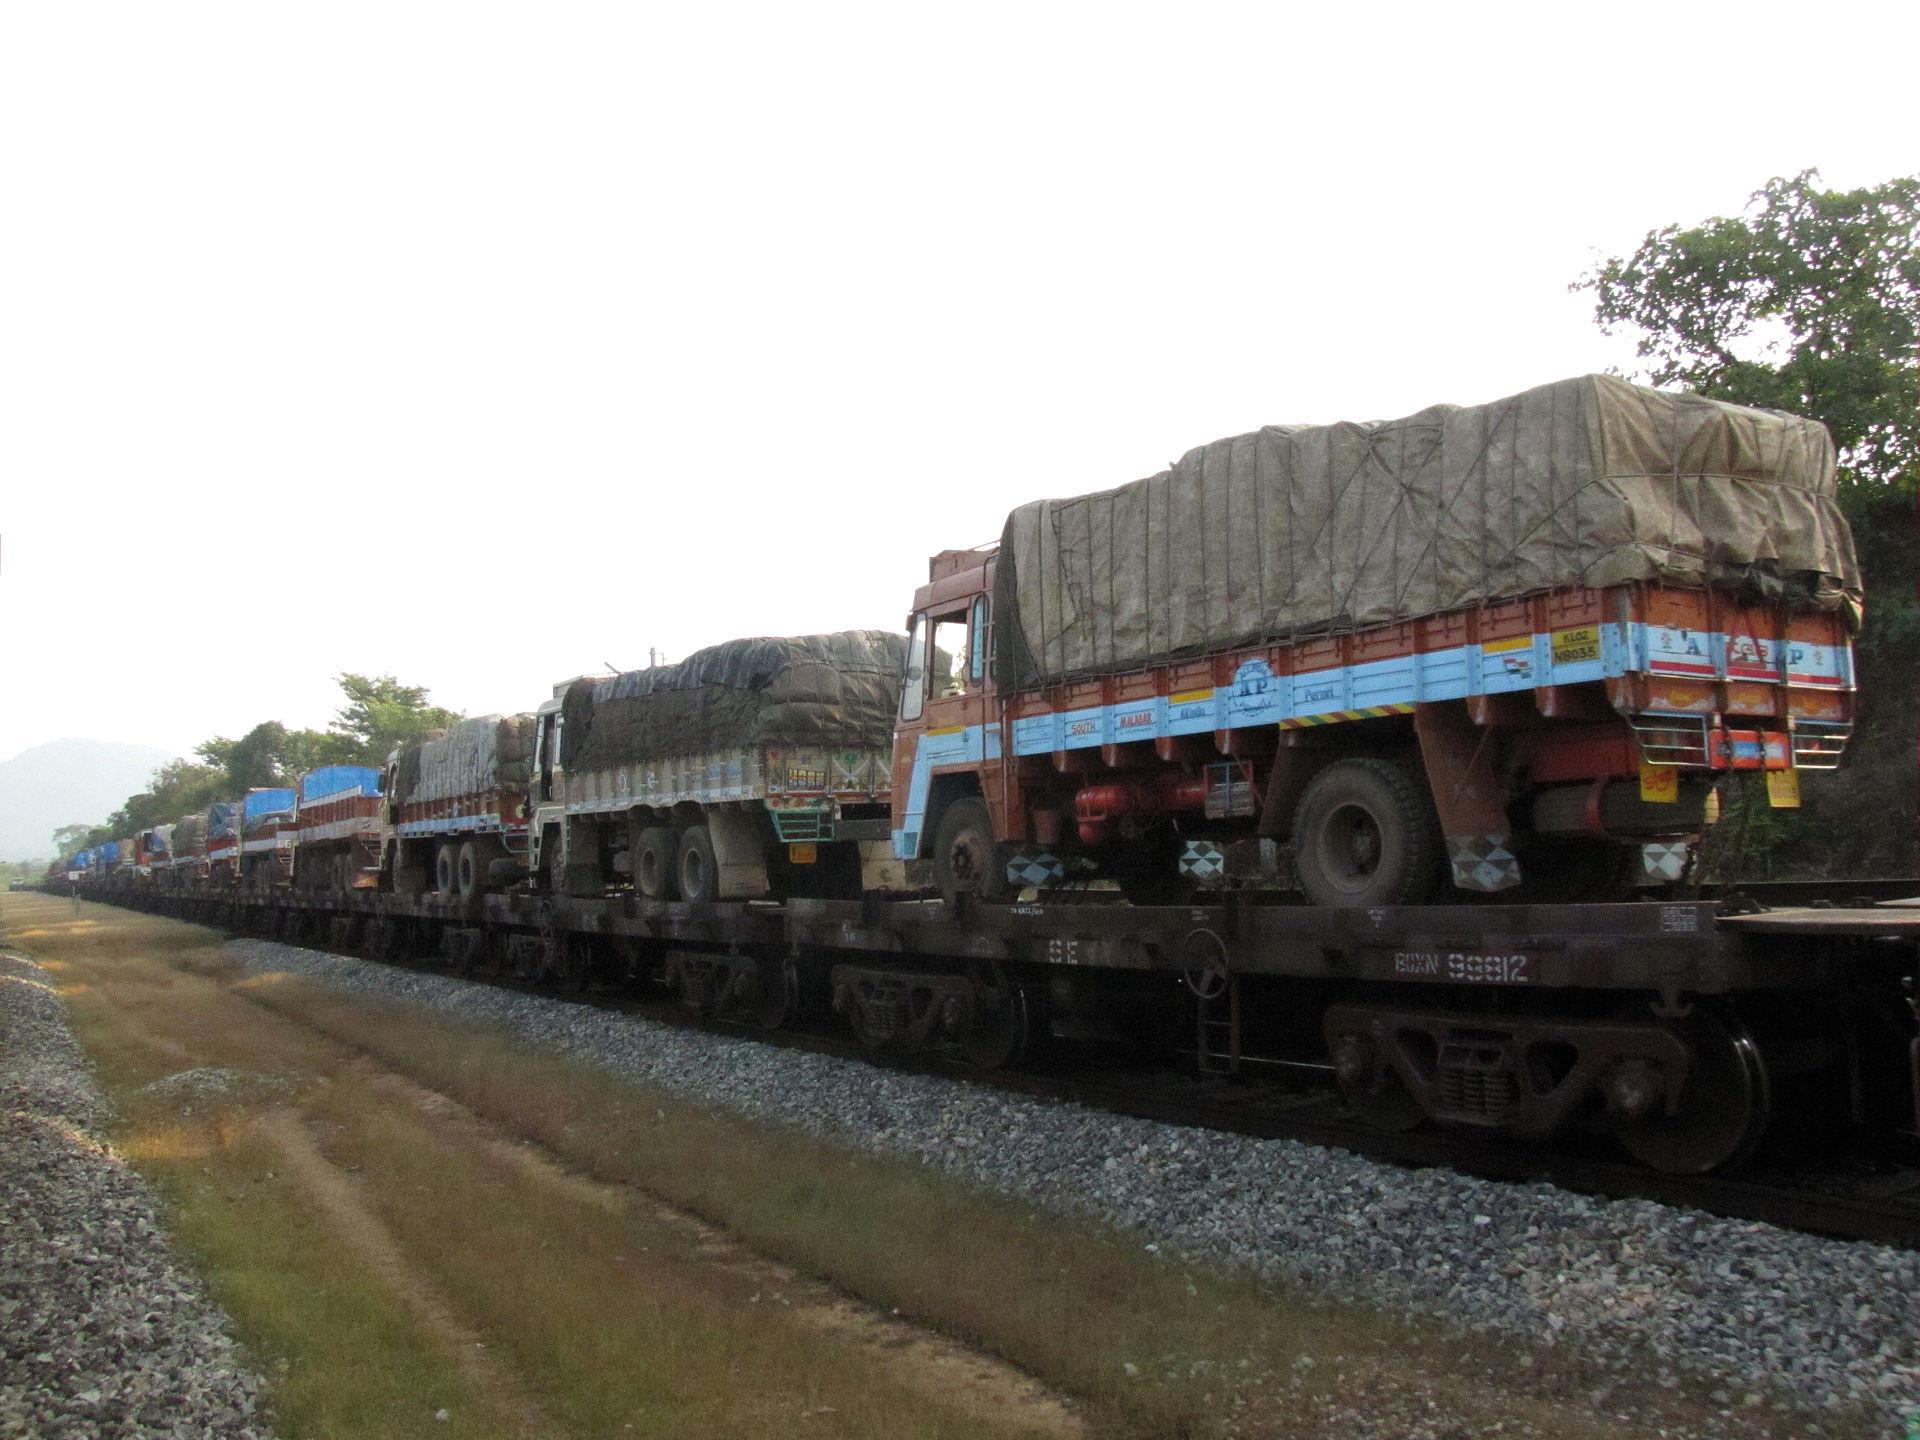 Figure 3. Trucks on a train in India